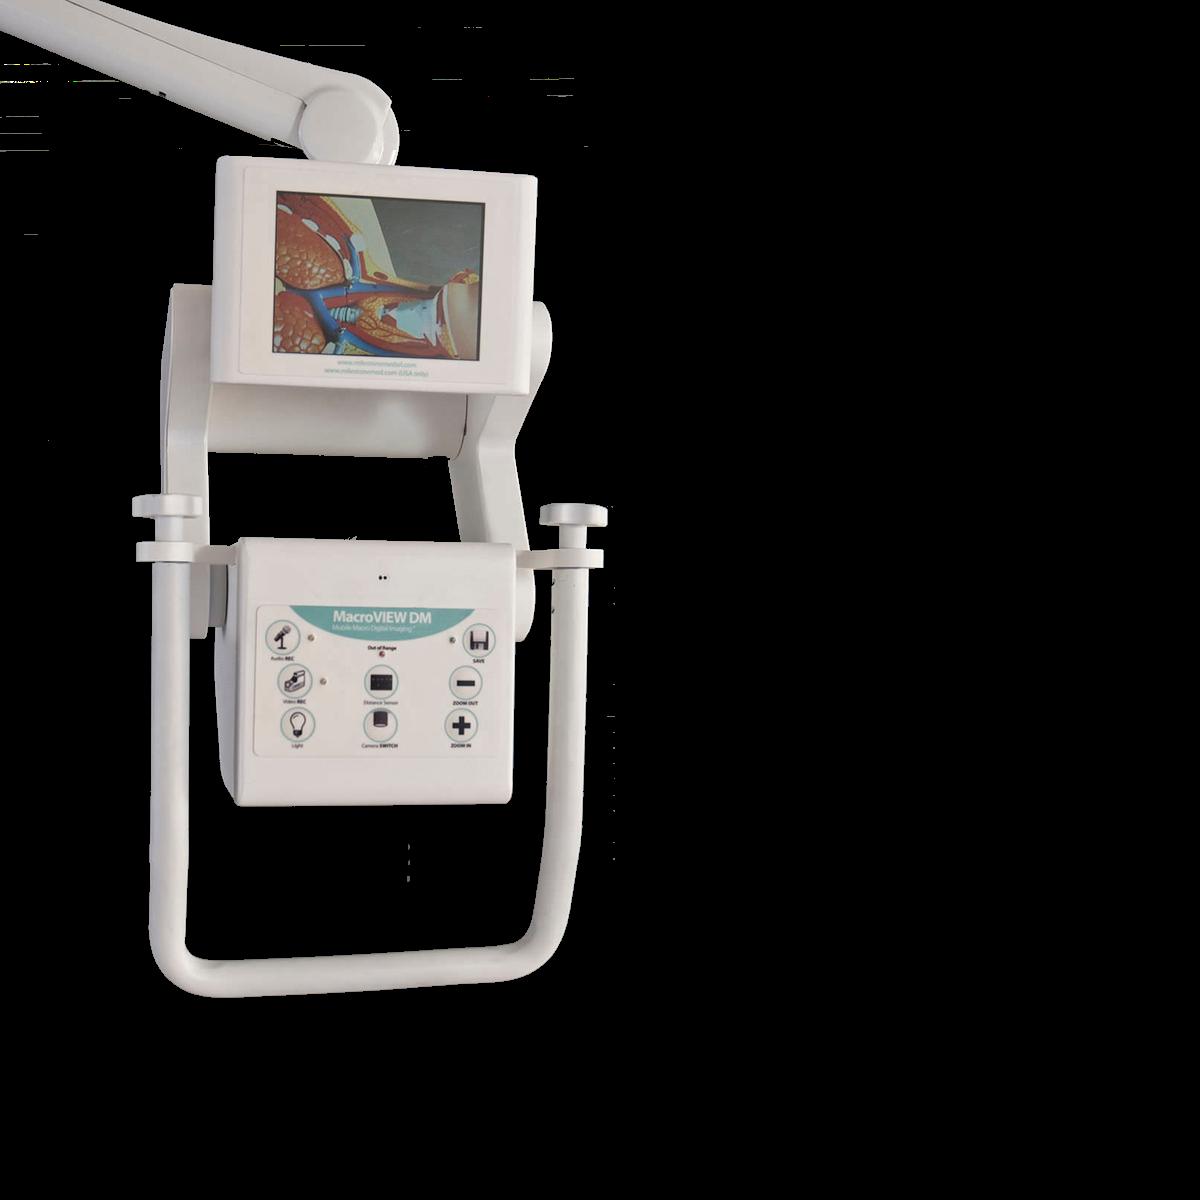 Macroscopic imaging workstation